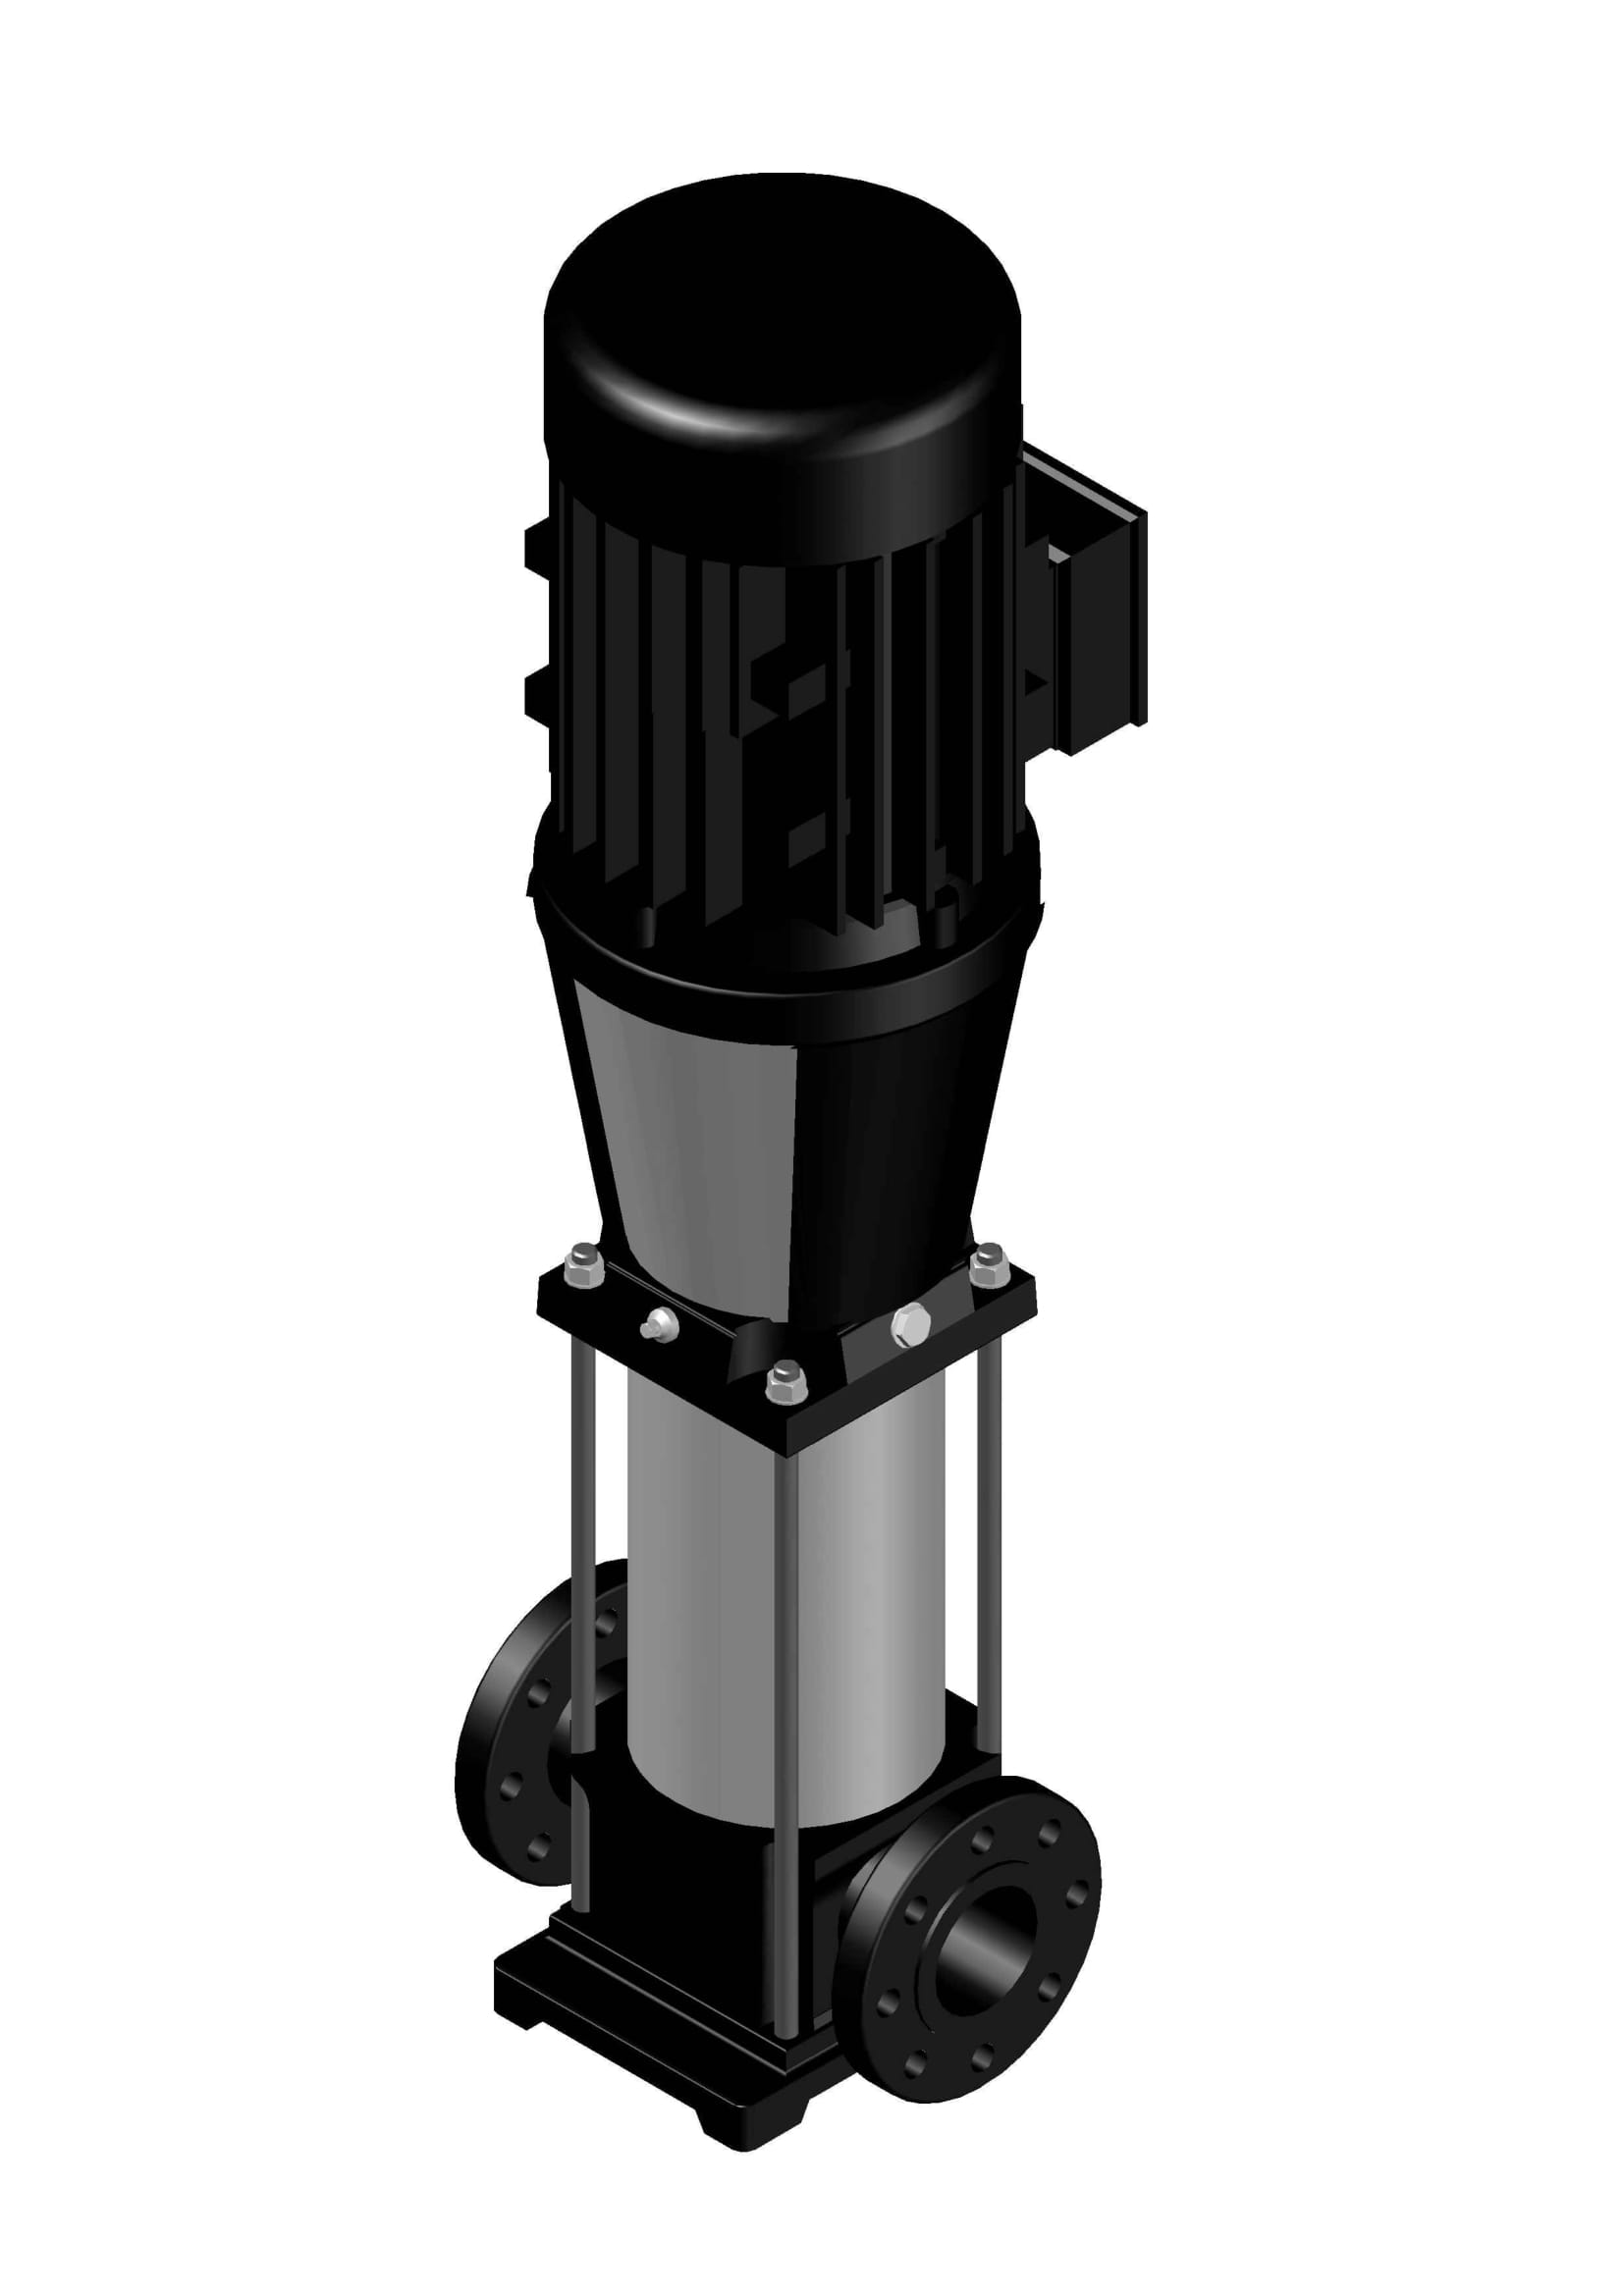 BV 64-03-02